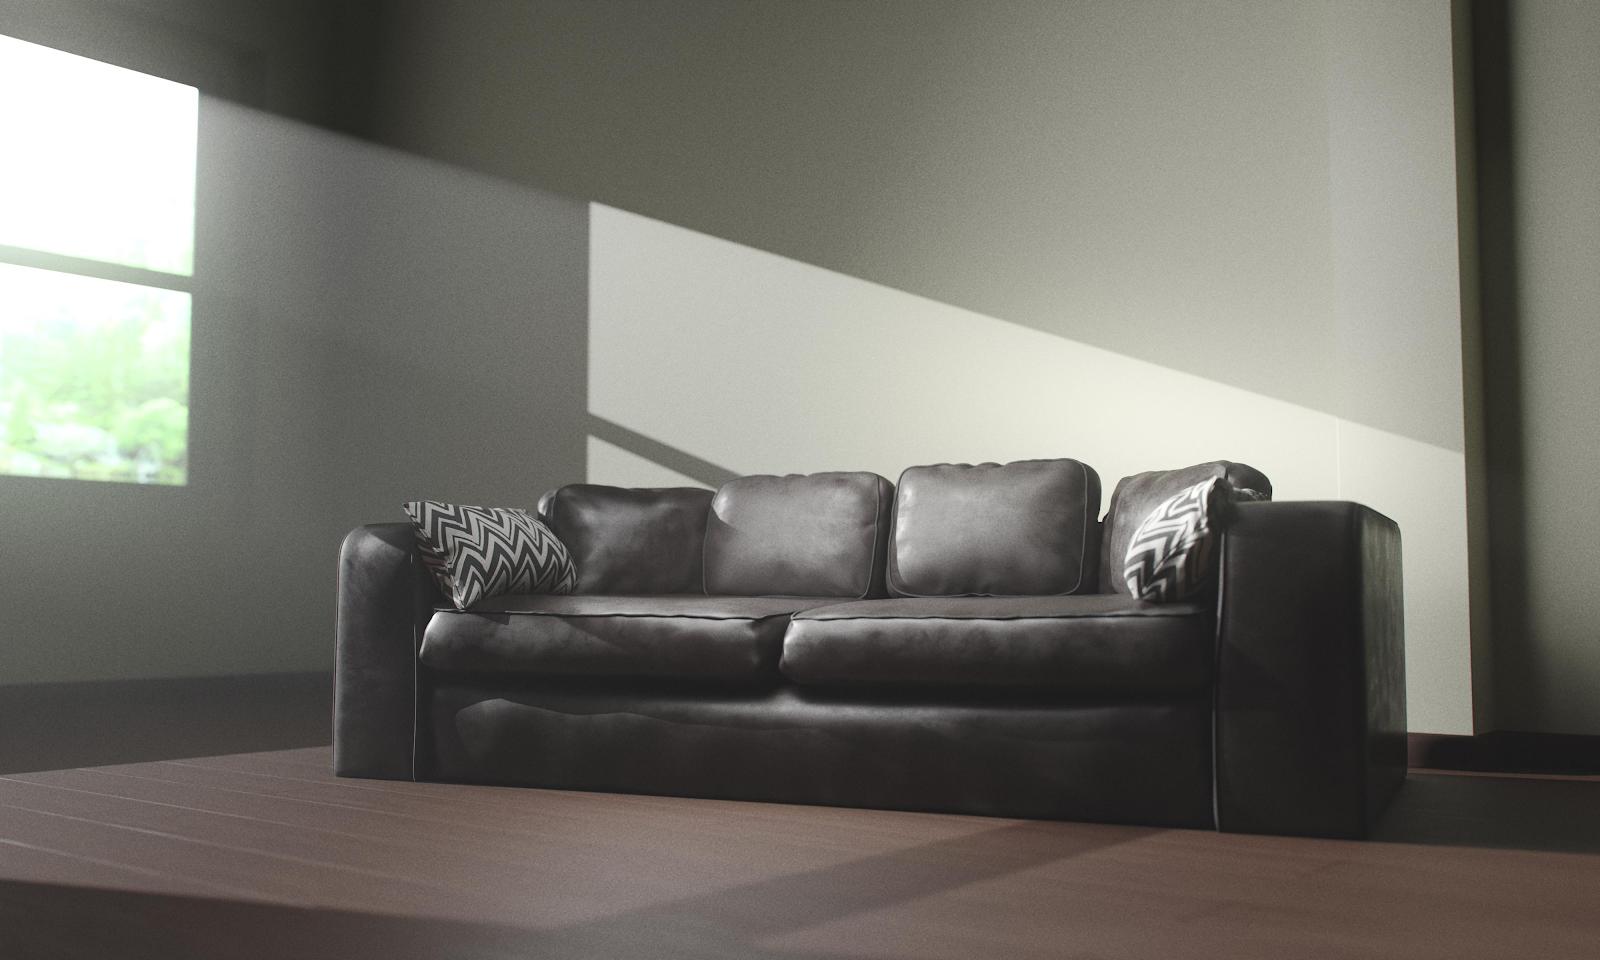 black sofa hit by sunlight